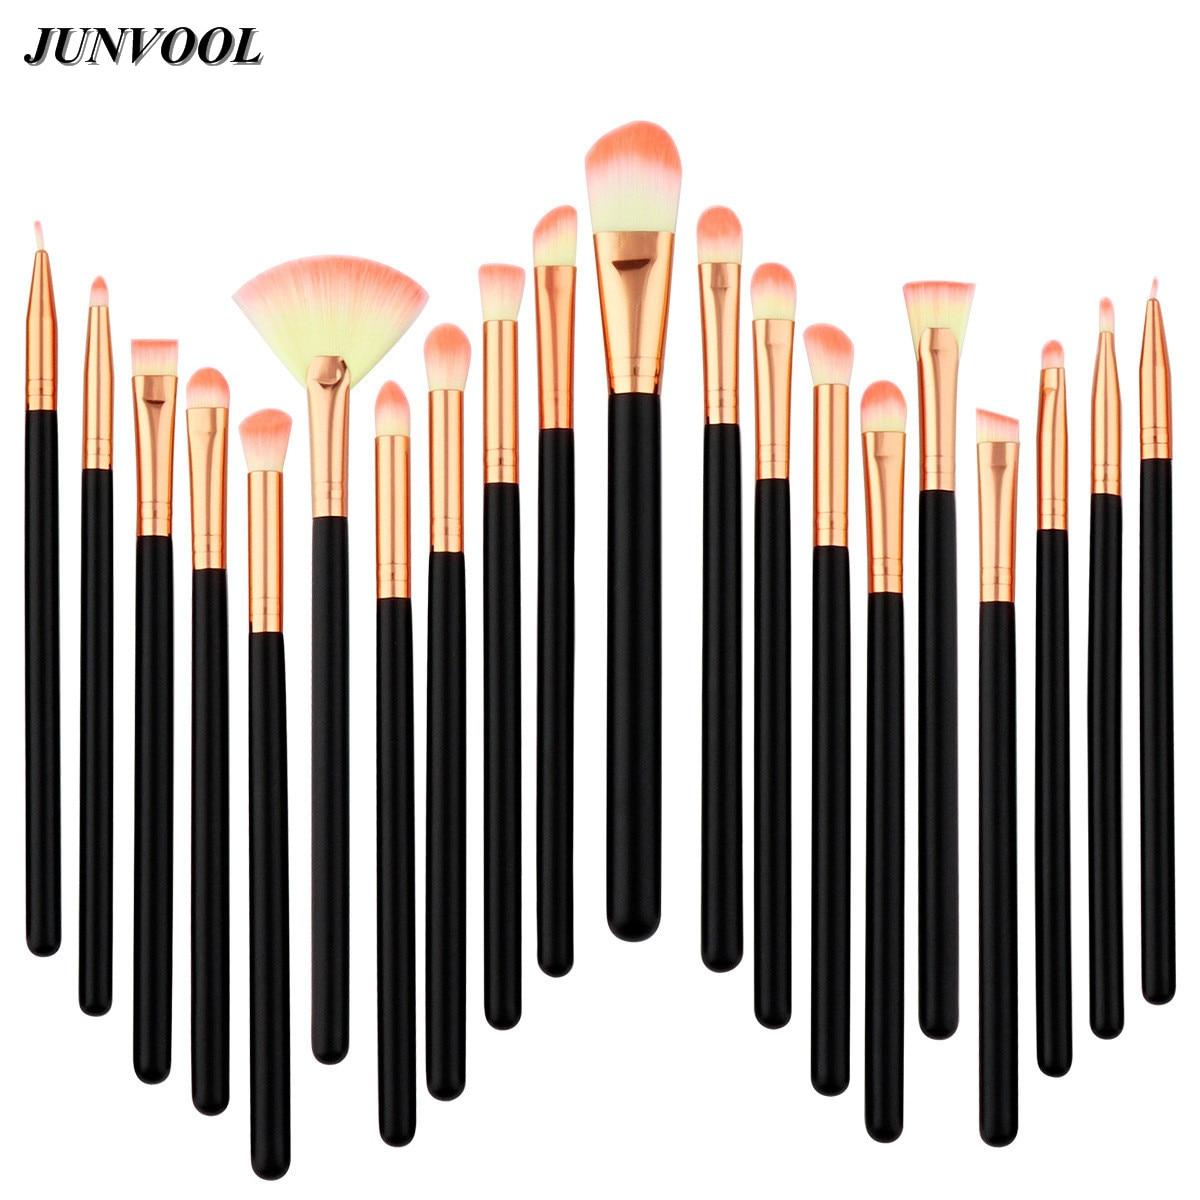 цены на 20pcs A Set of Brushes for Make-up Professional Pink Hair Eye Shadow Foundation Eyebrow Lip Makeup Fan Brush Suit Make Up Tools в интернет-магазинах